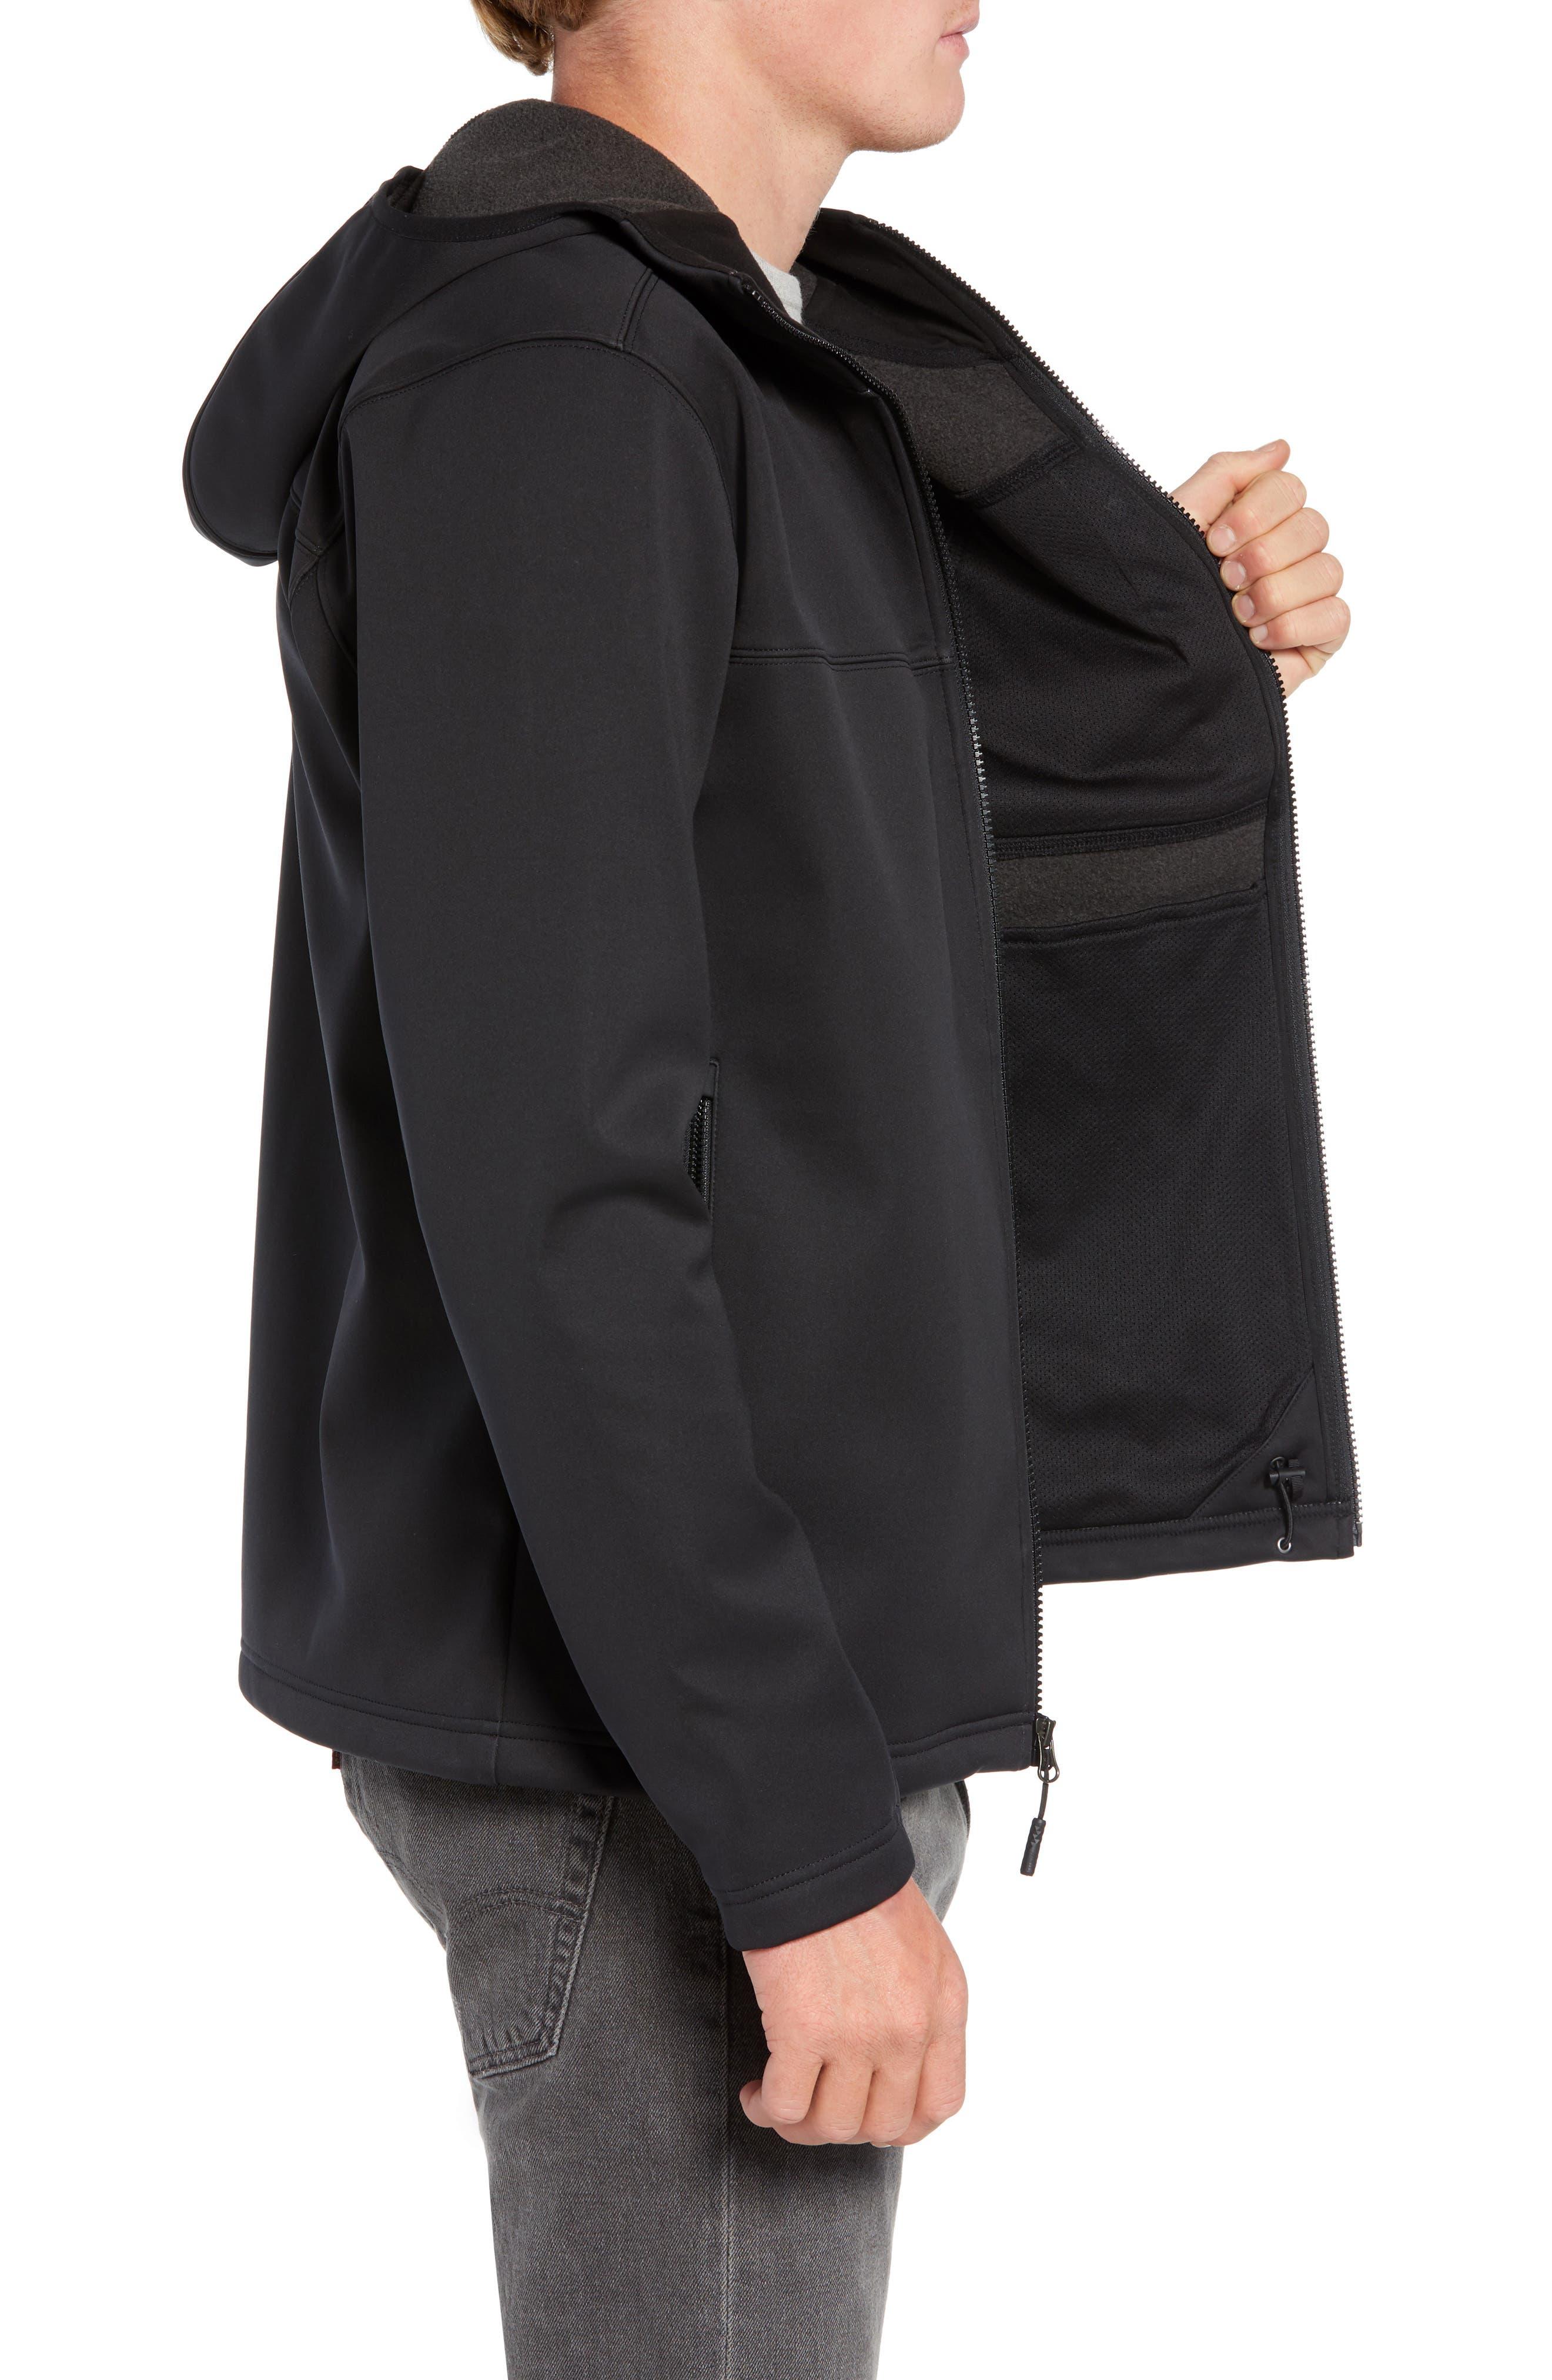 North Face Apex Risor Hooded Jacket,                             Alternate thumbnail 3, color,                             TNF BLACK/ TNF BLACK